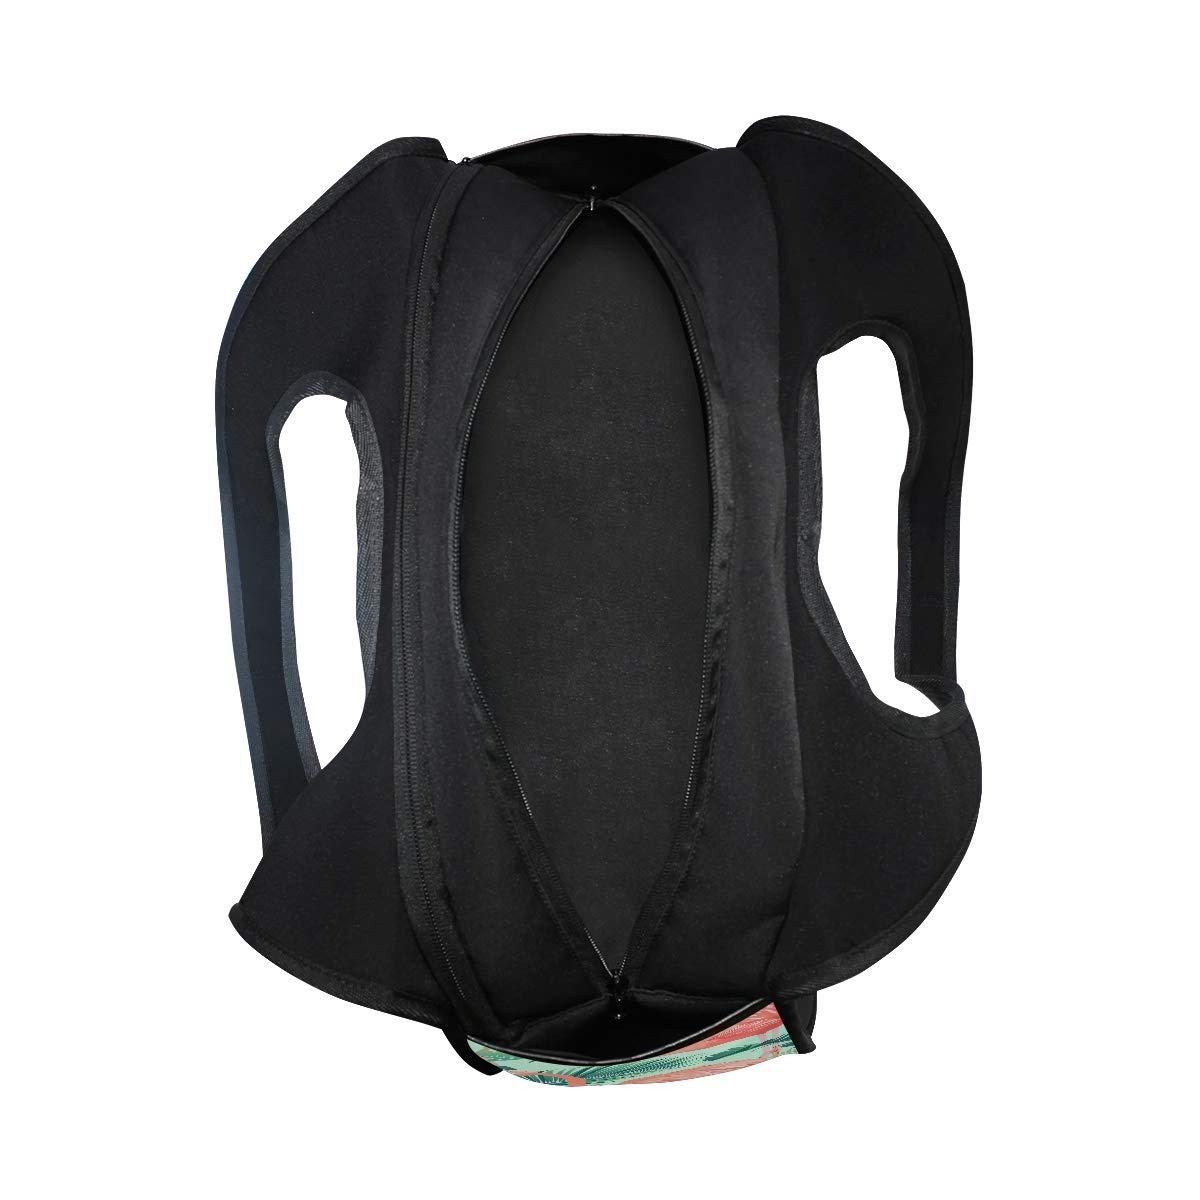 Flamingo Birds And Tropical Leaves Women Sports Gym Totes Bag Multi-Function Nylon Travel Shoulder Bag